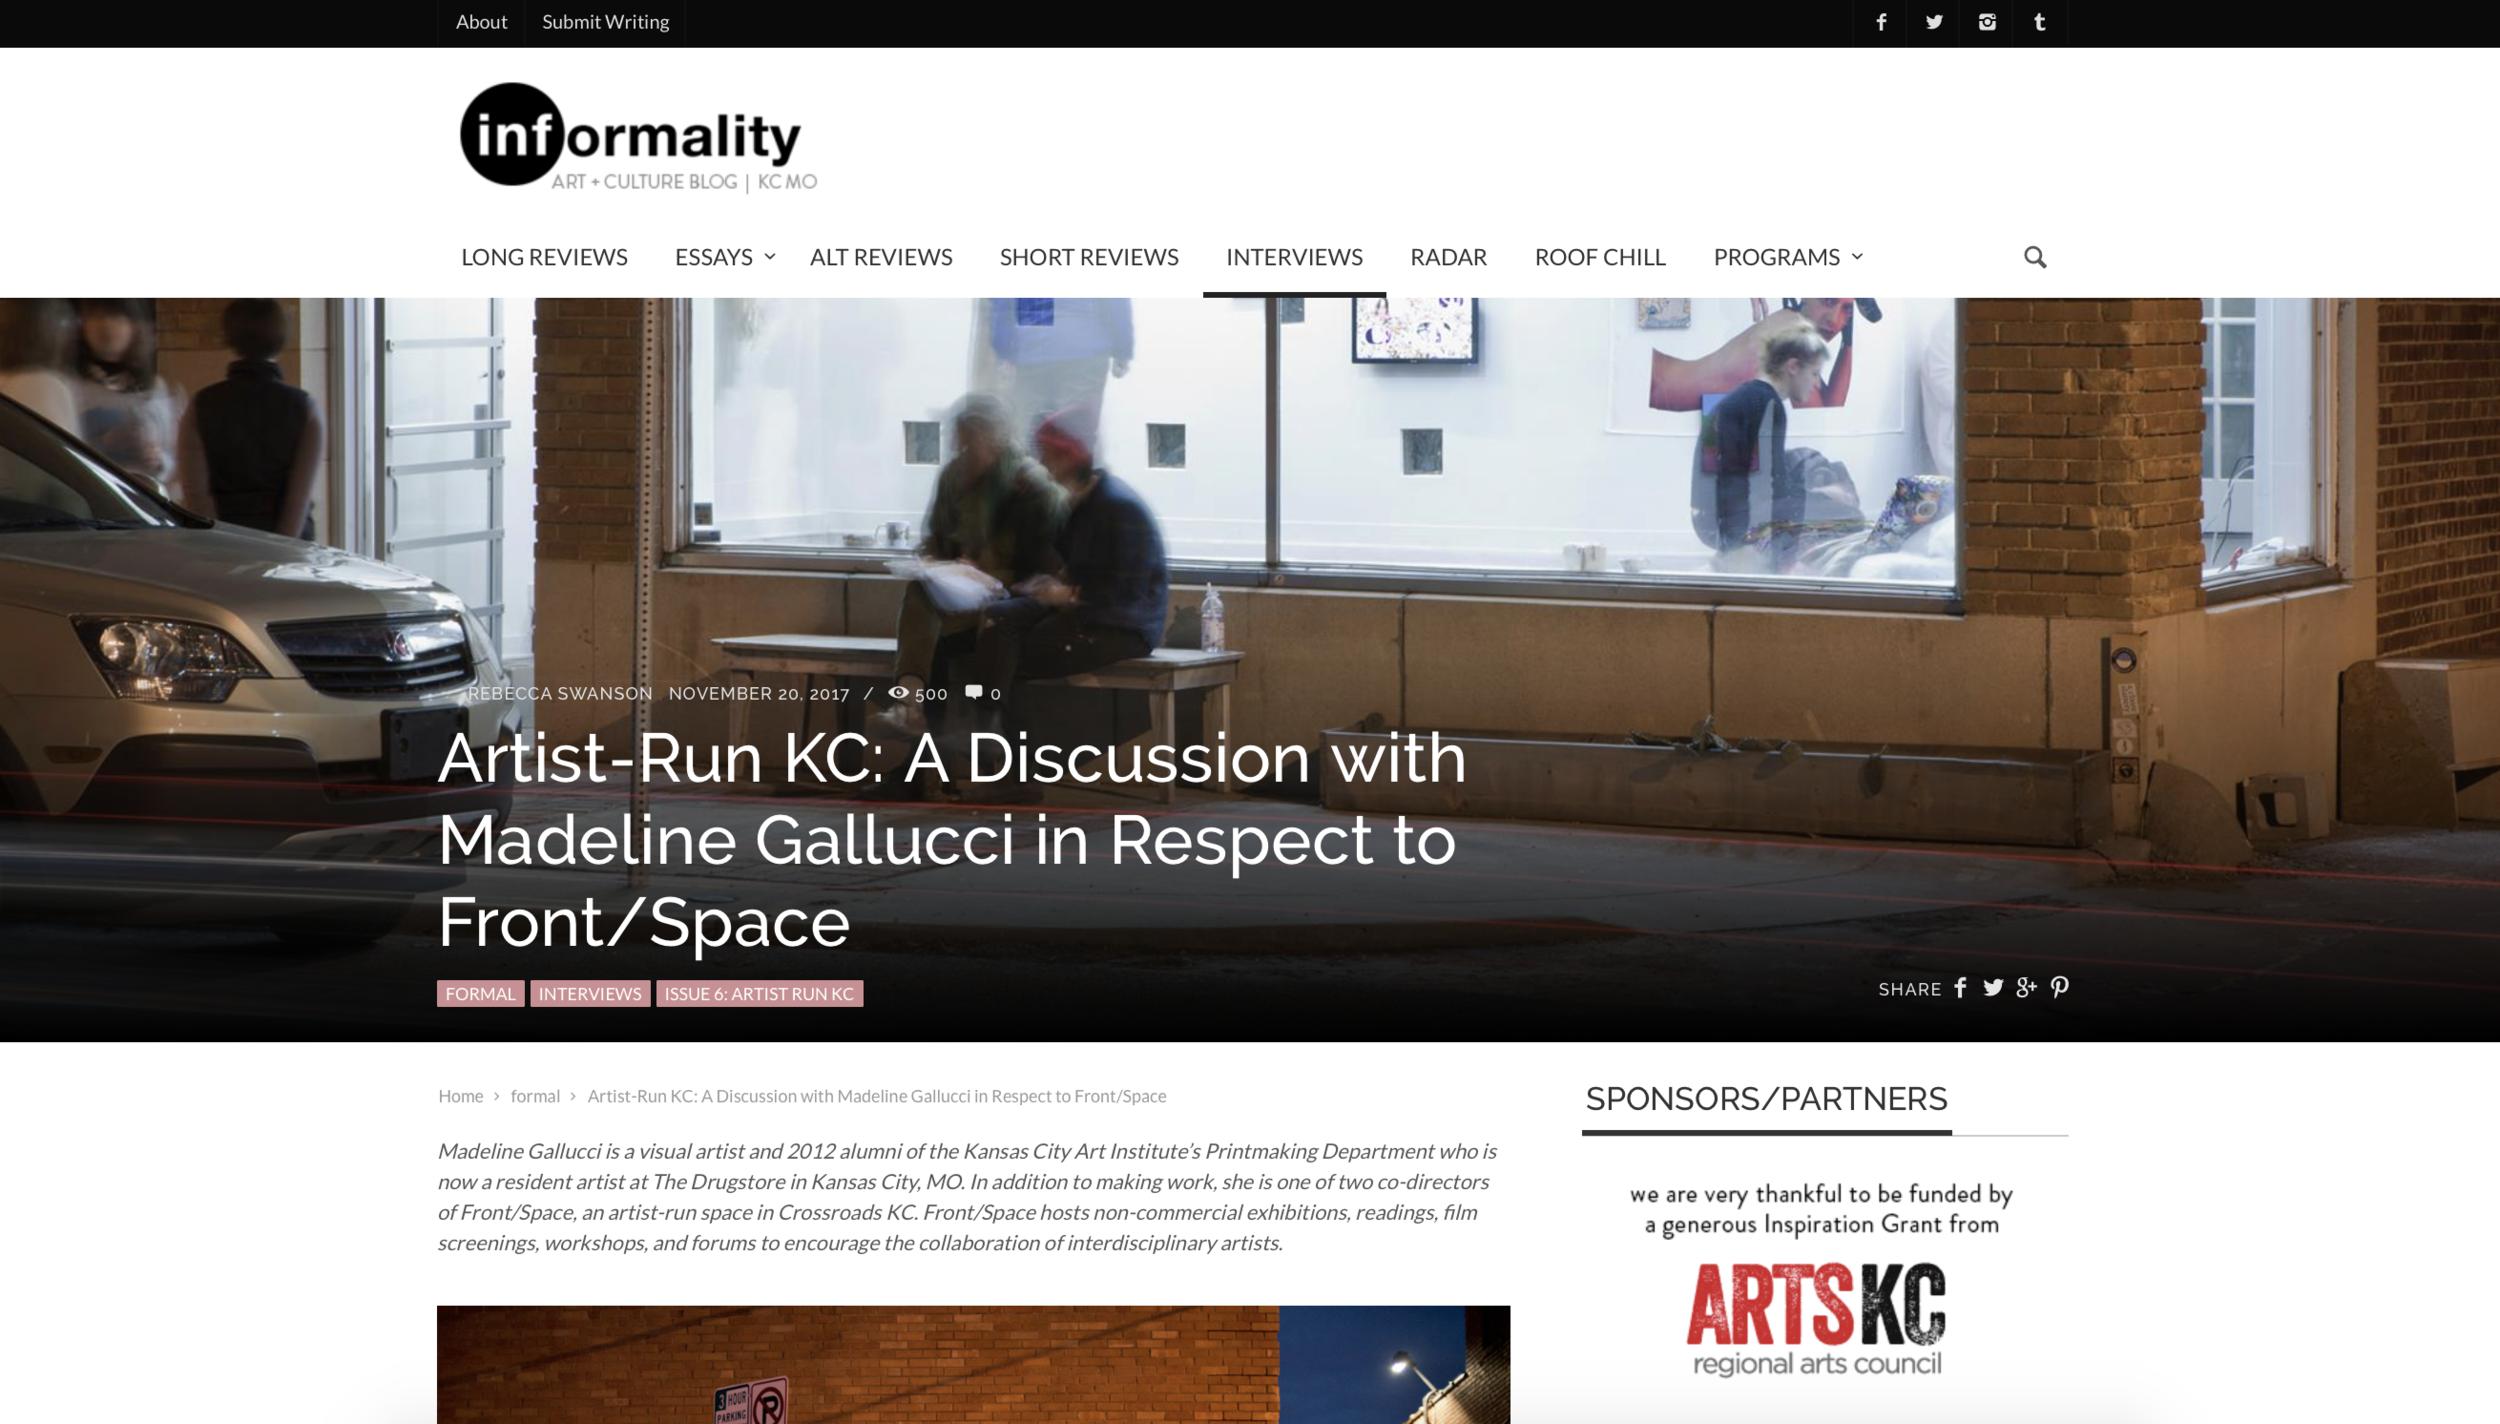 Screenshot from December 2017 informalityblog.com